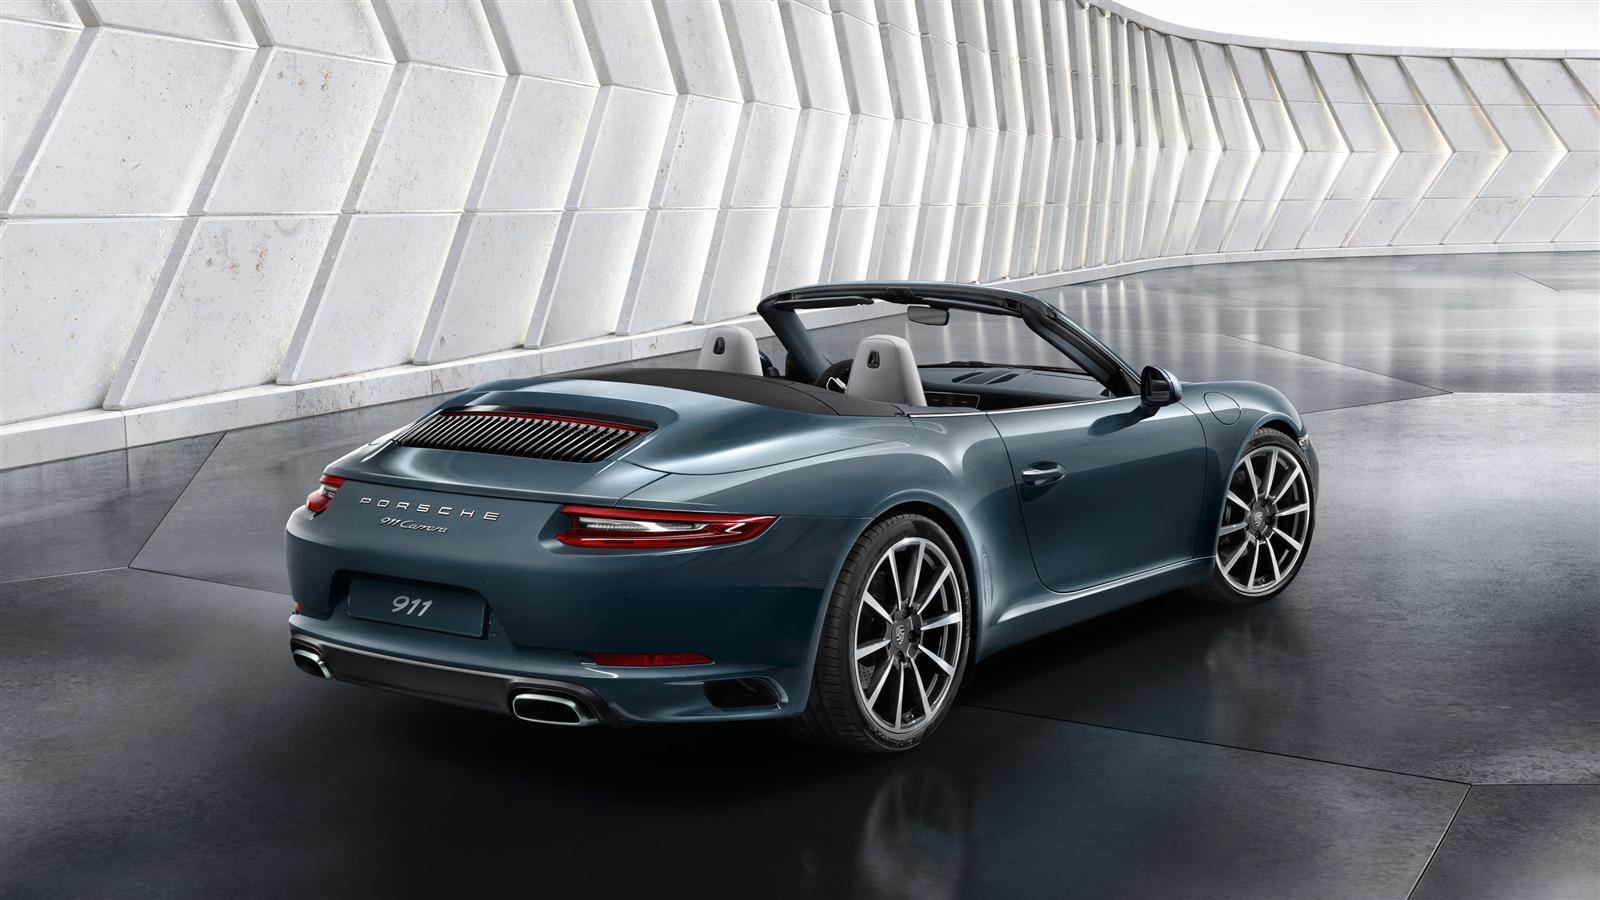 Porsche 911 Carrera Galerie Amp Downloads Porsche